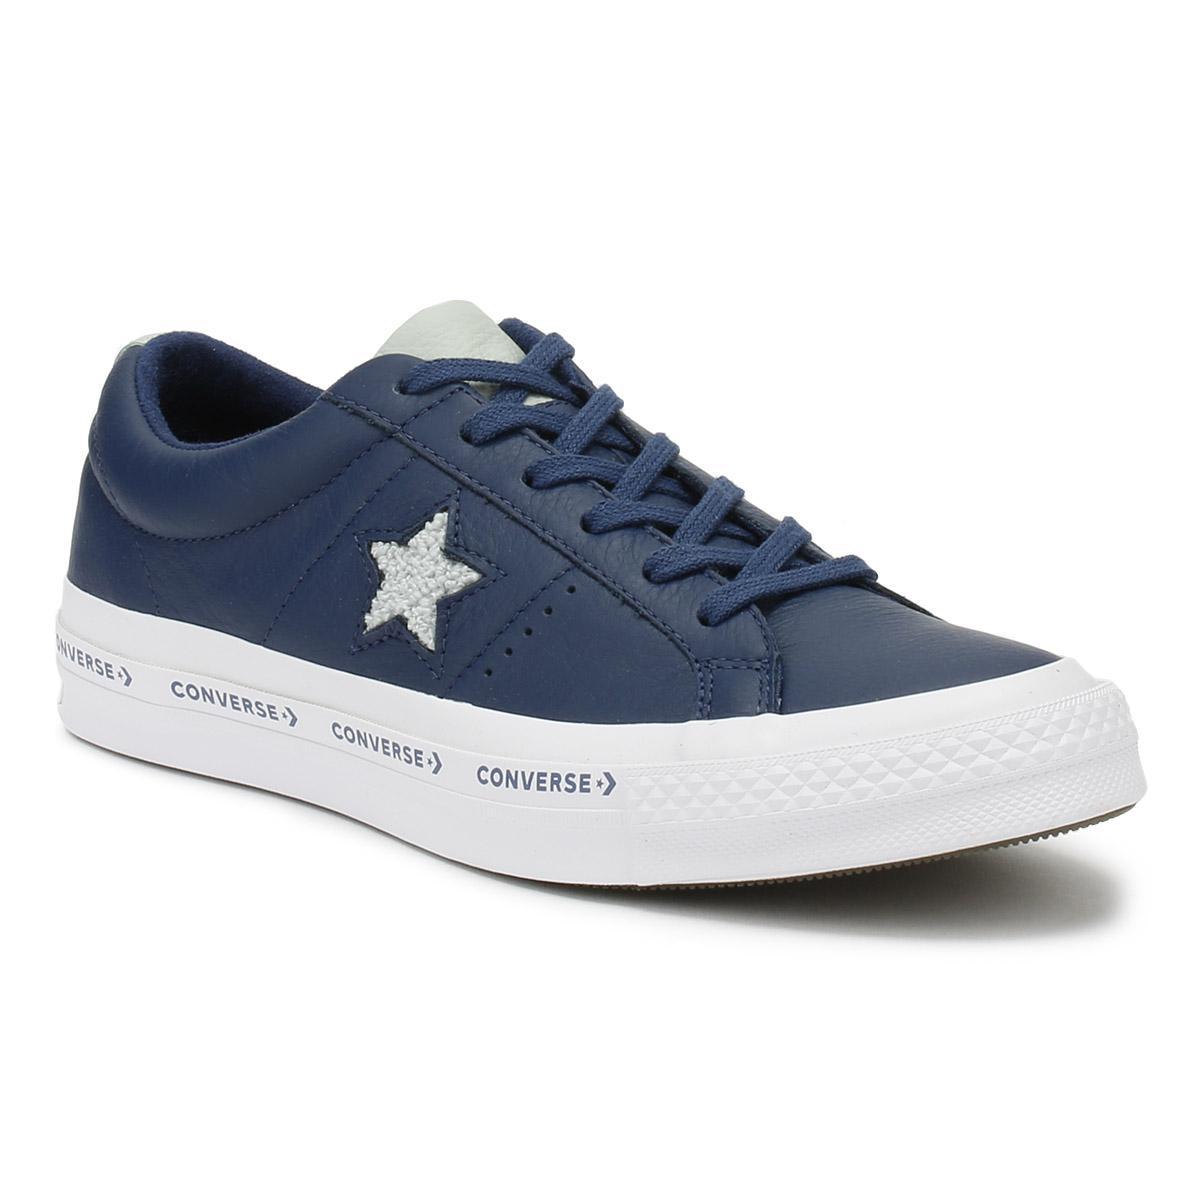 Baskets ONE STAR PINSTRIPE CONVERSE blu Converse dBymoI9U4